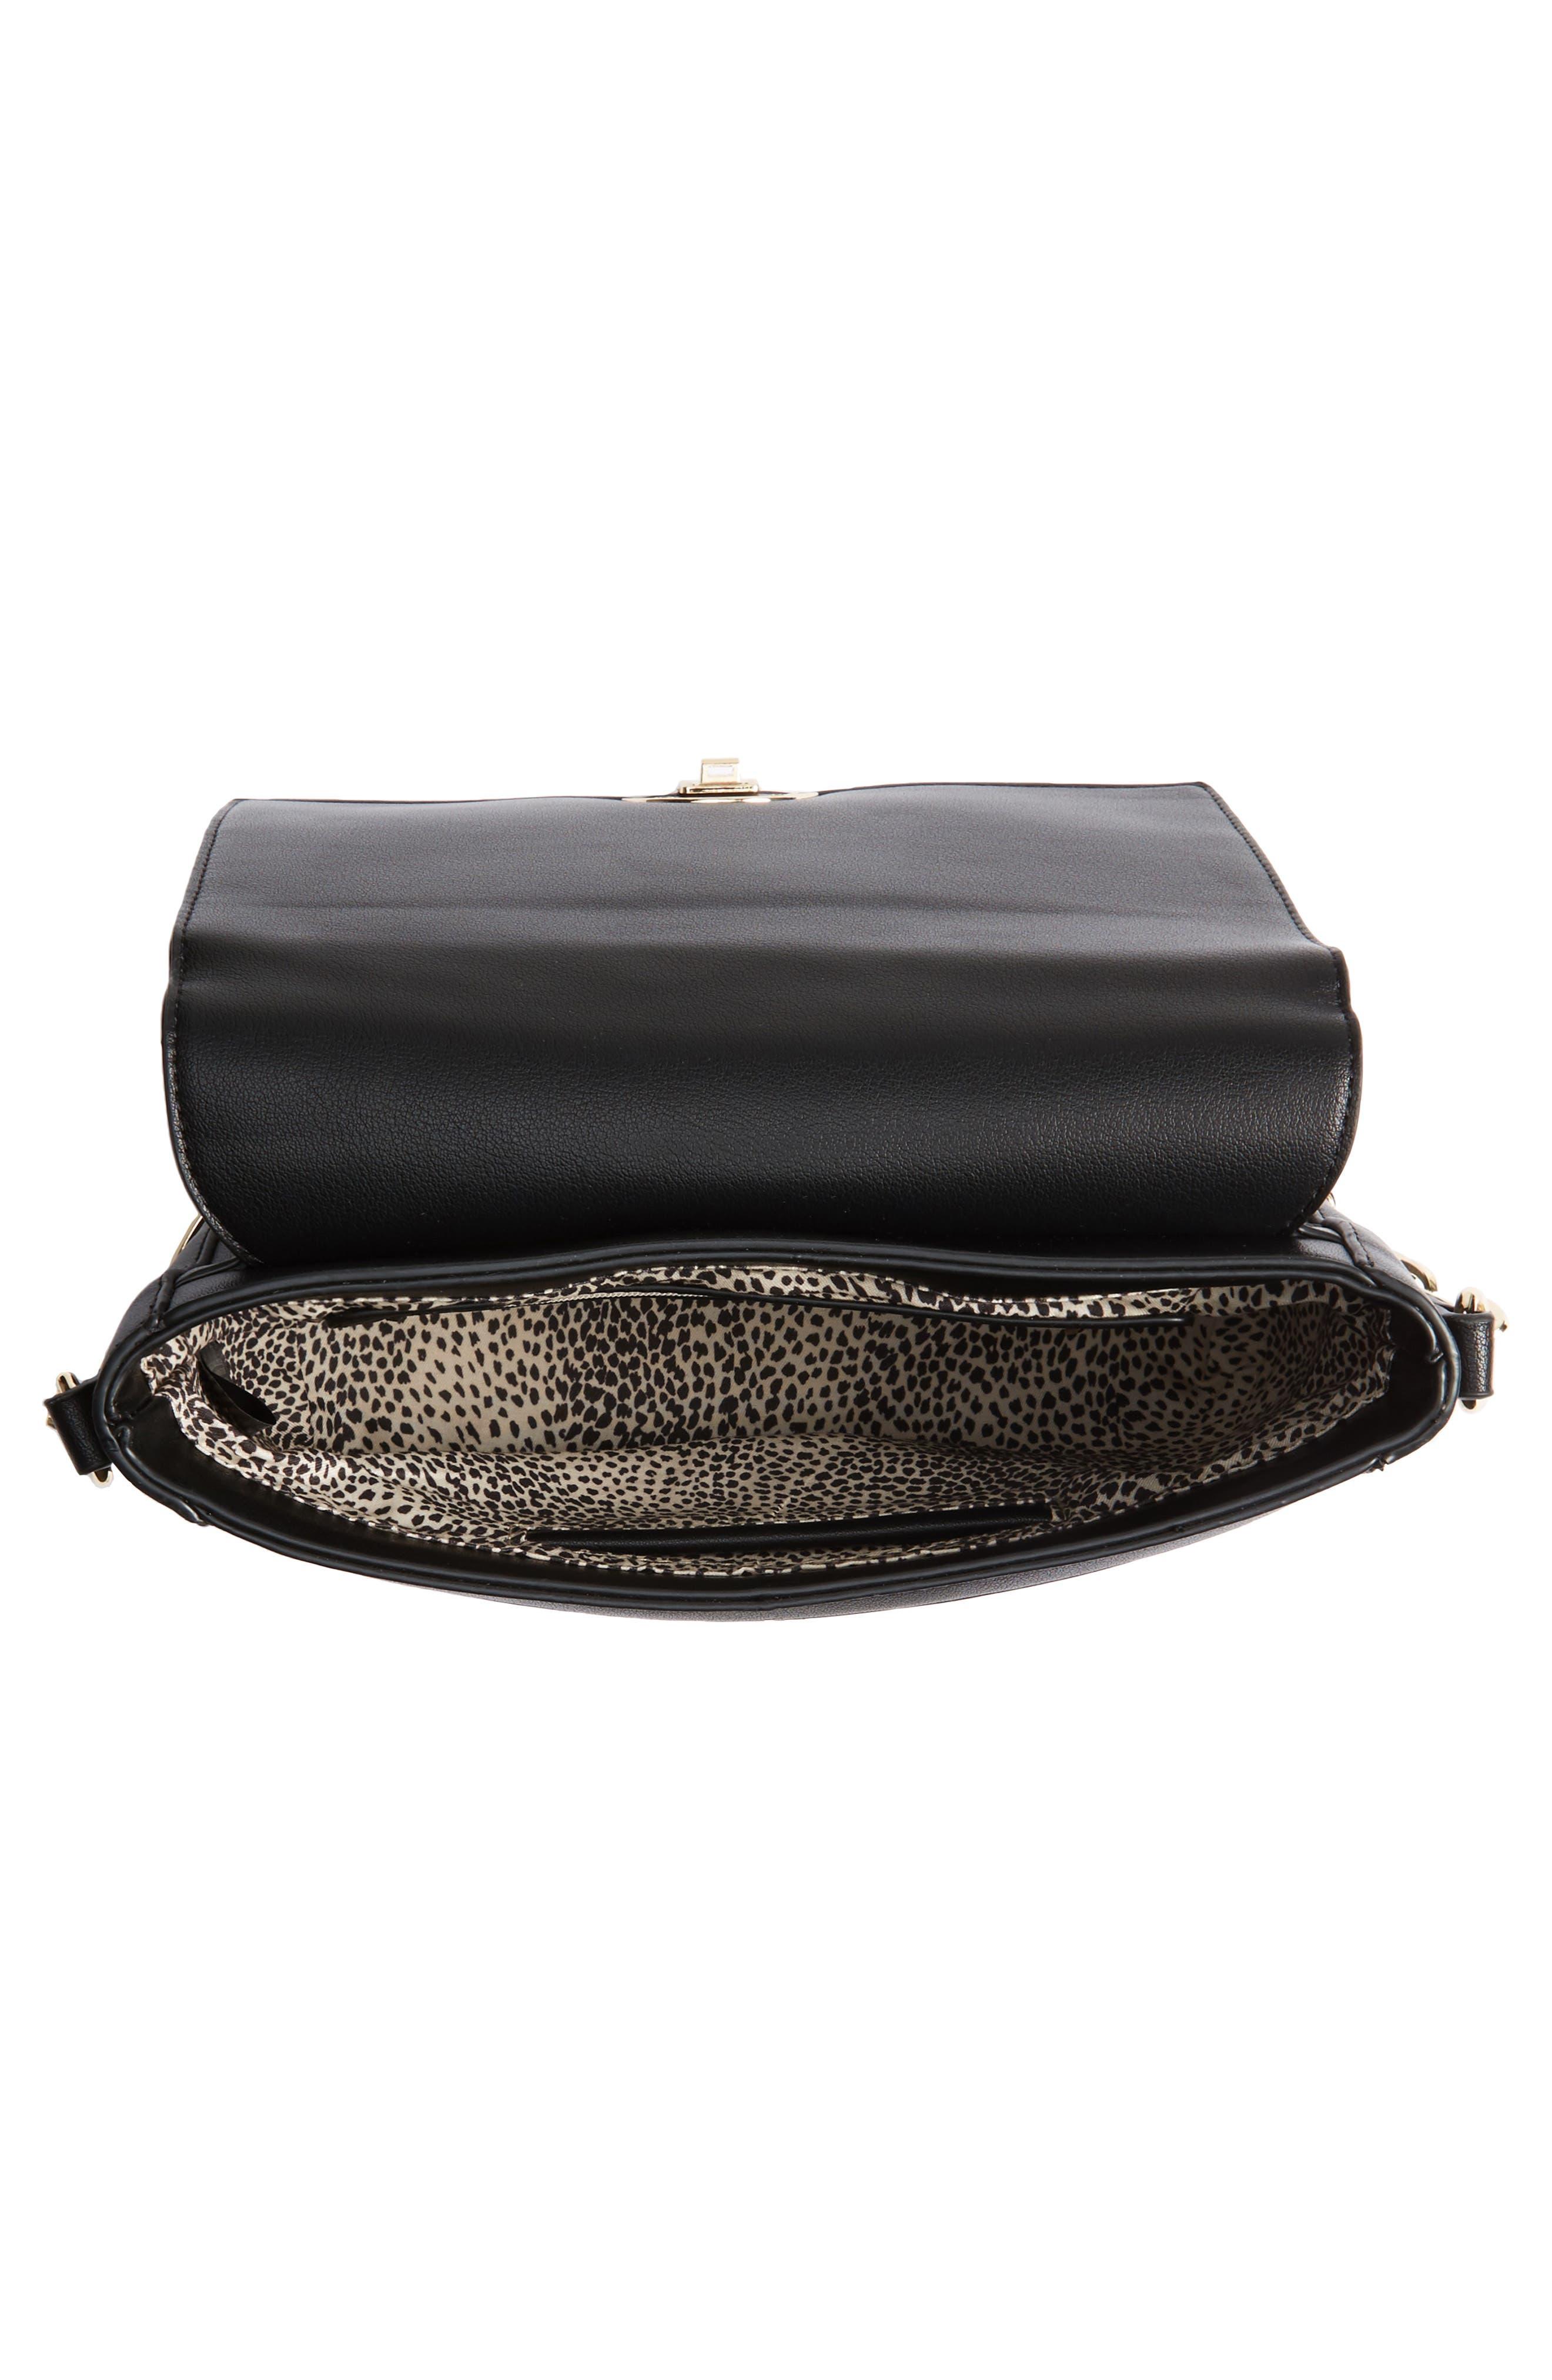 Colie Faux Leather Crossbody Bag,                             Alternate thumbnail 4, color,                             001